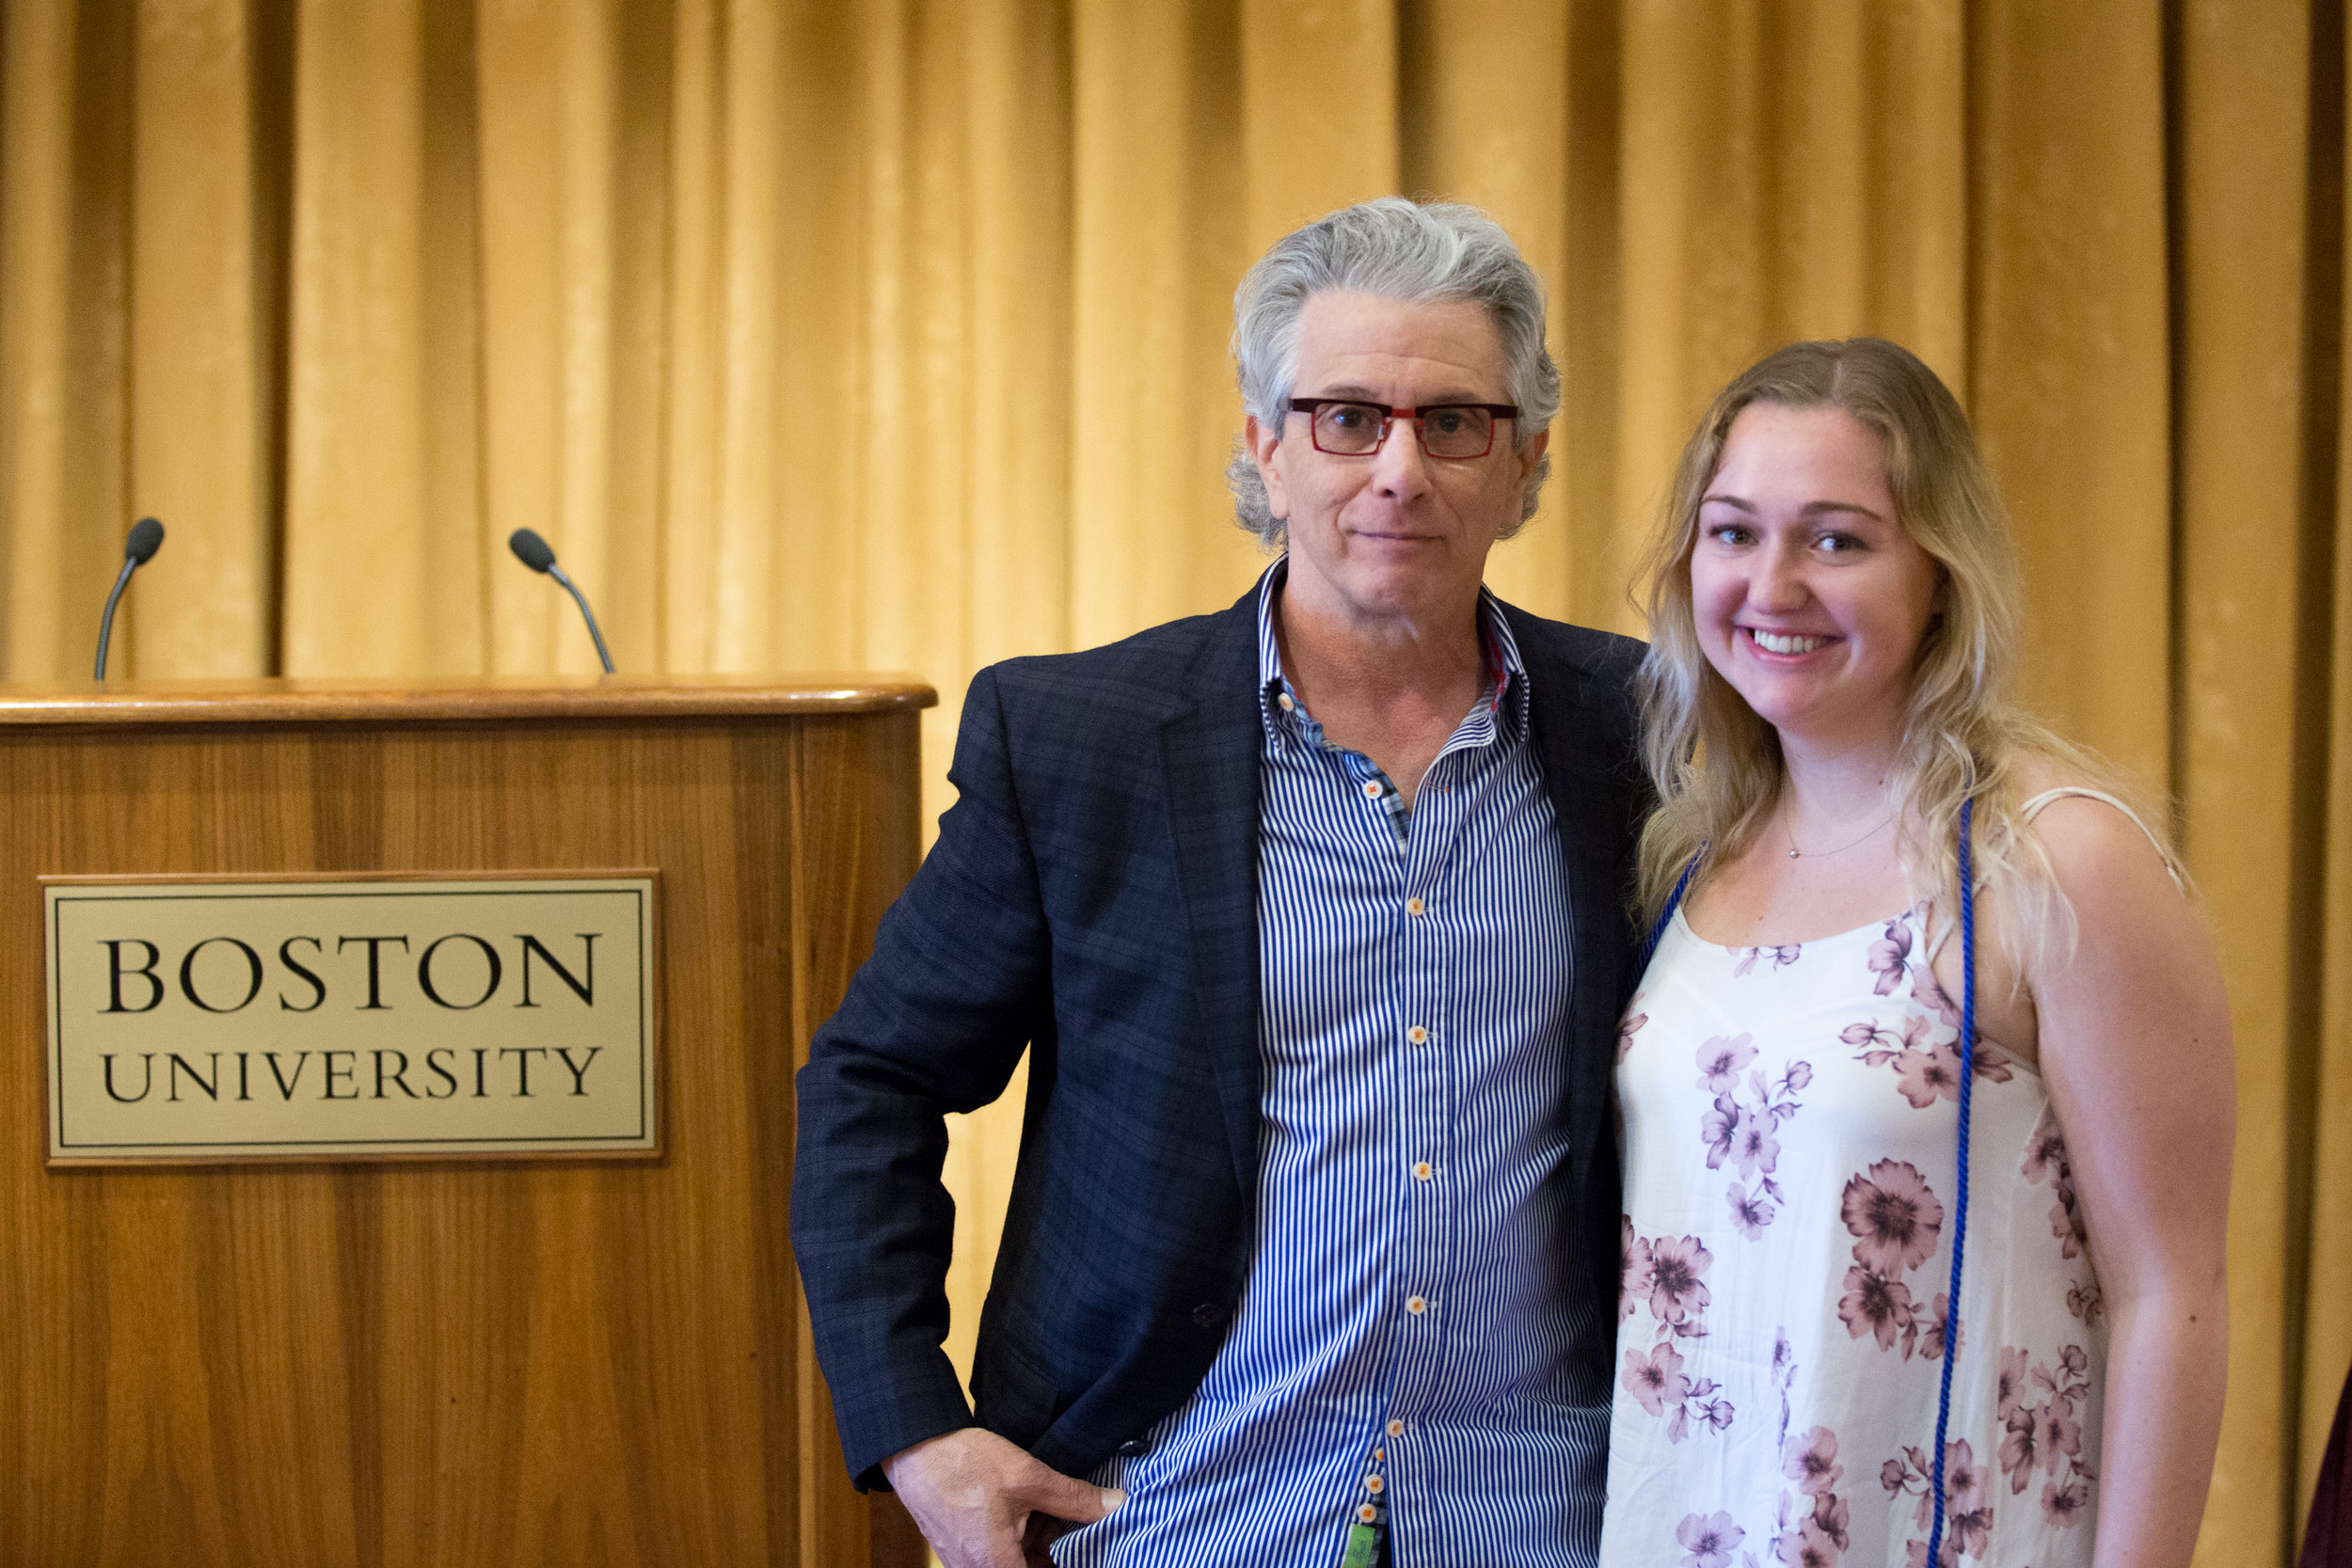 Edward Boches Presents the Blue Chip award to Karli Bendlin